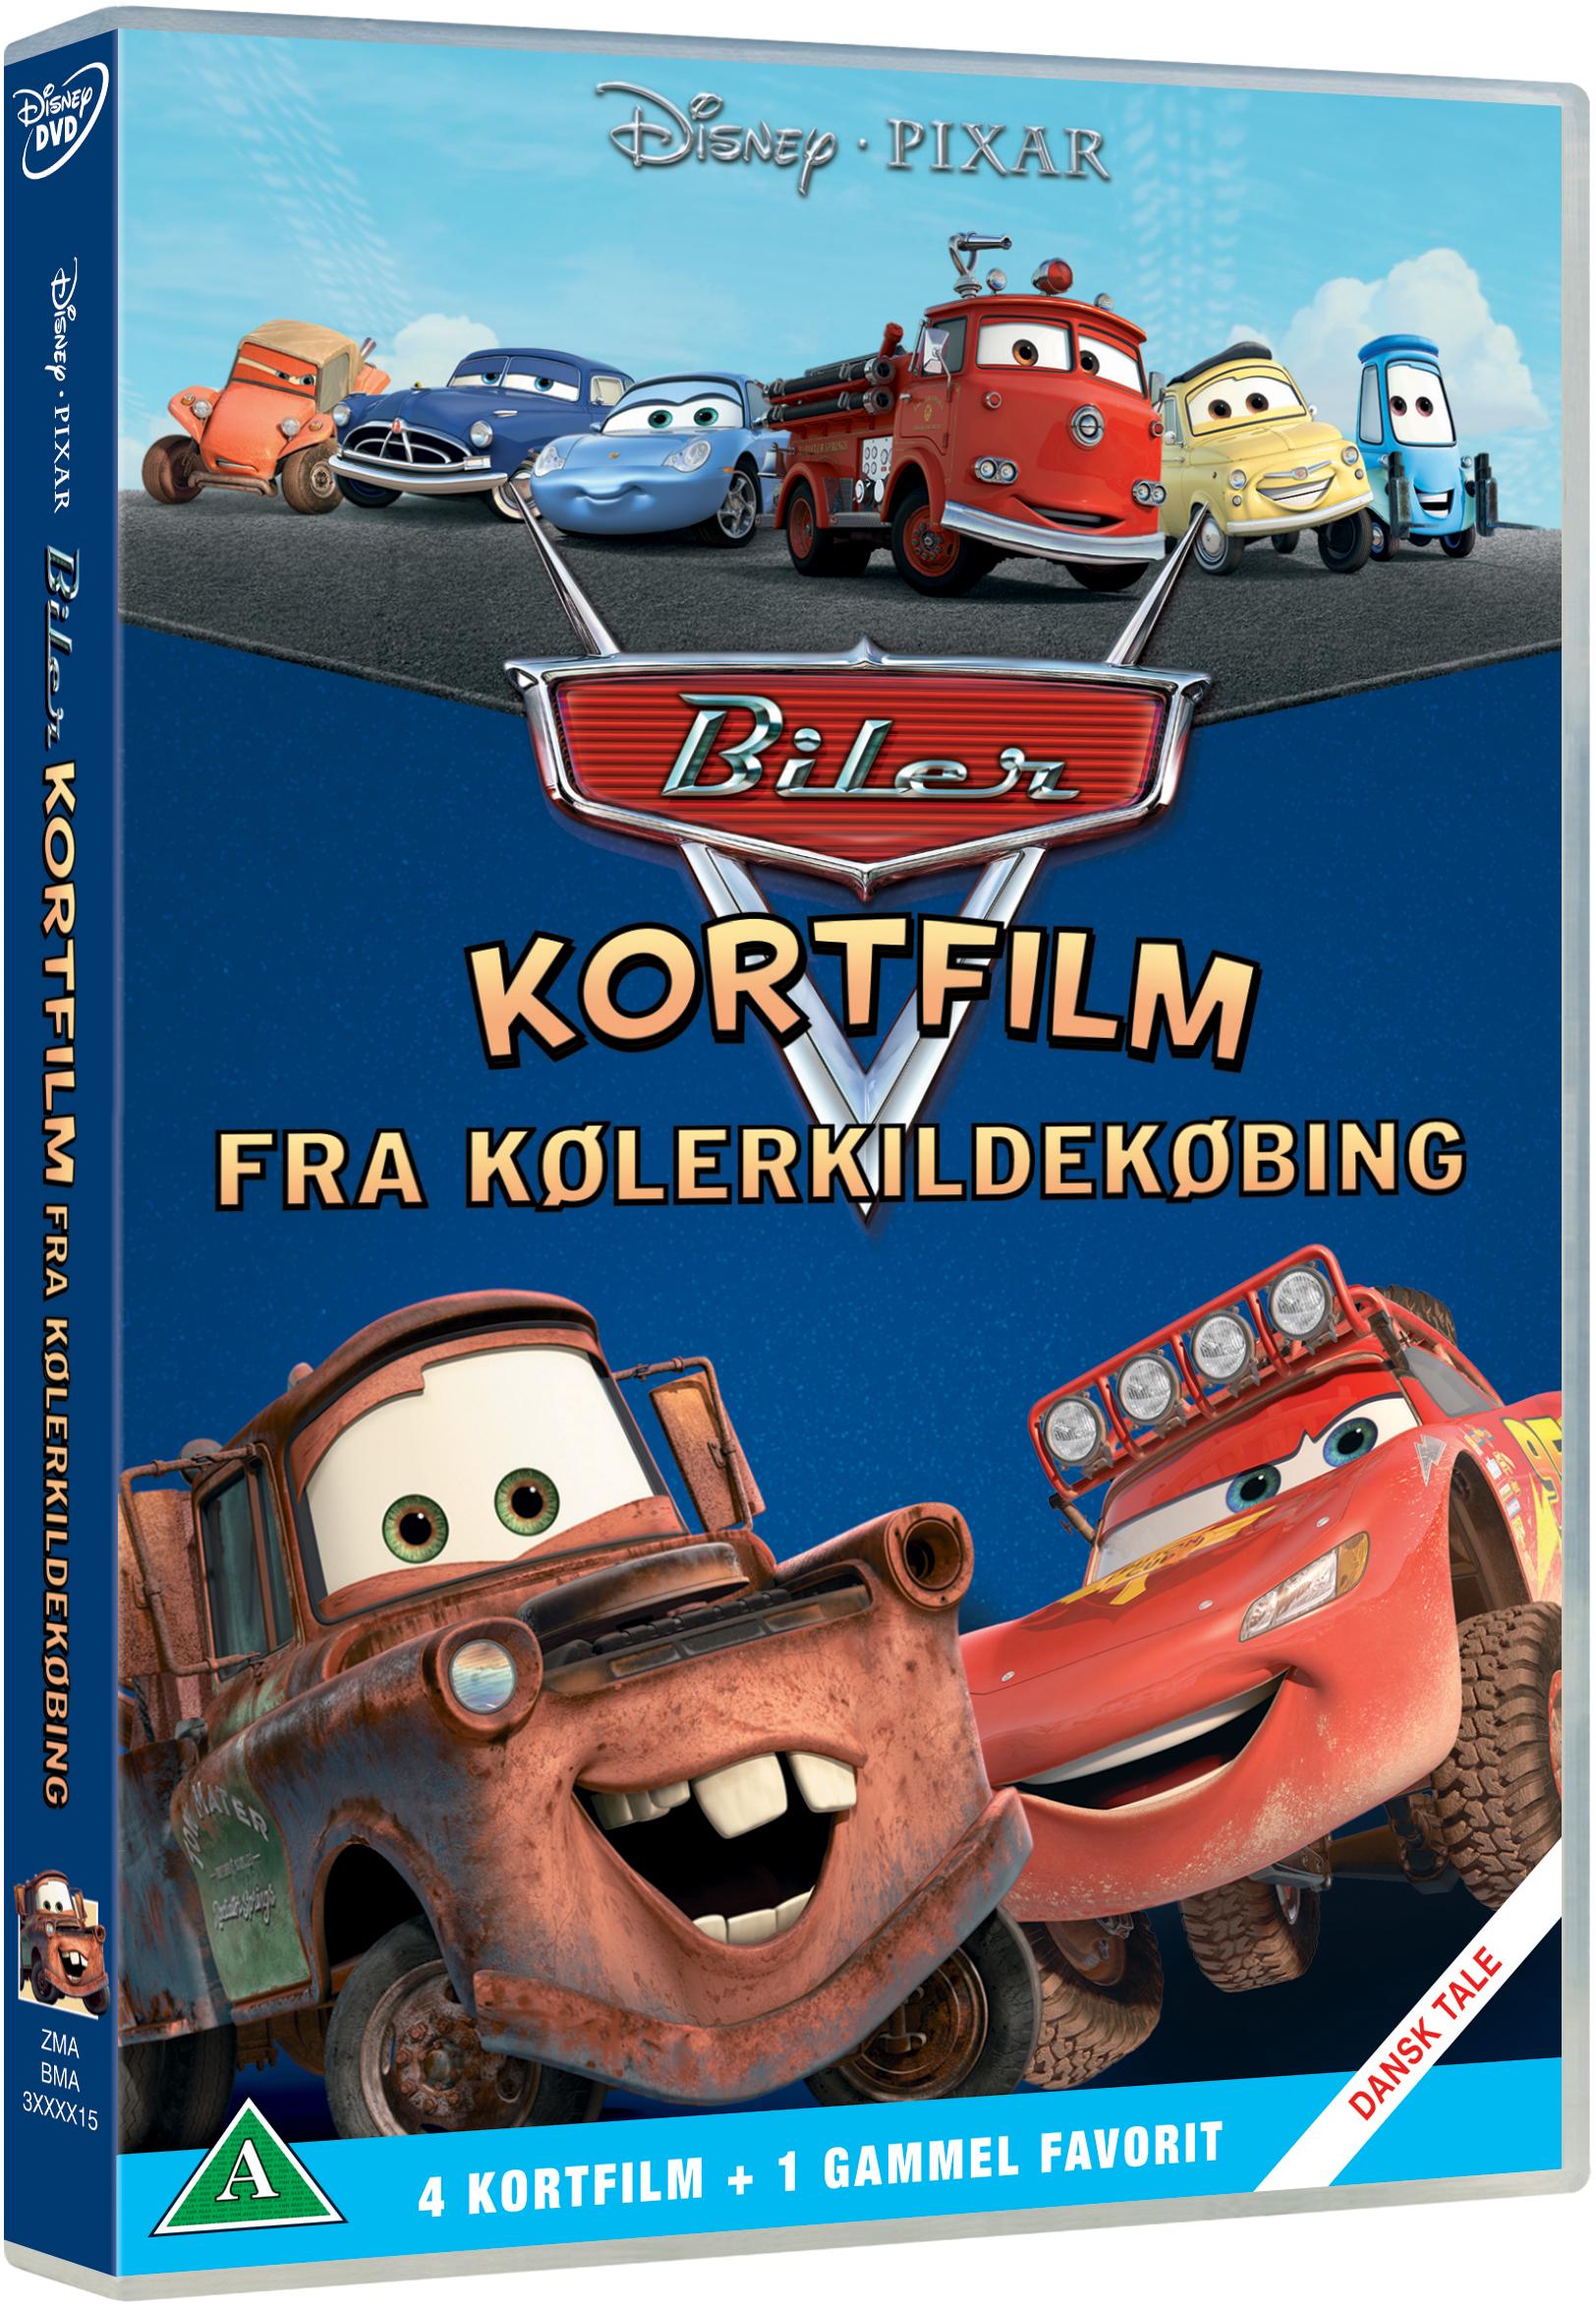 Buy Disneys Cars Shorts Radiator Spring Kolerkildekobing Dvd